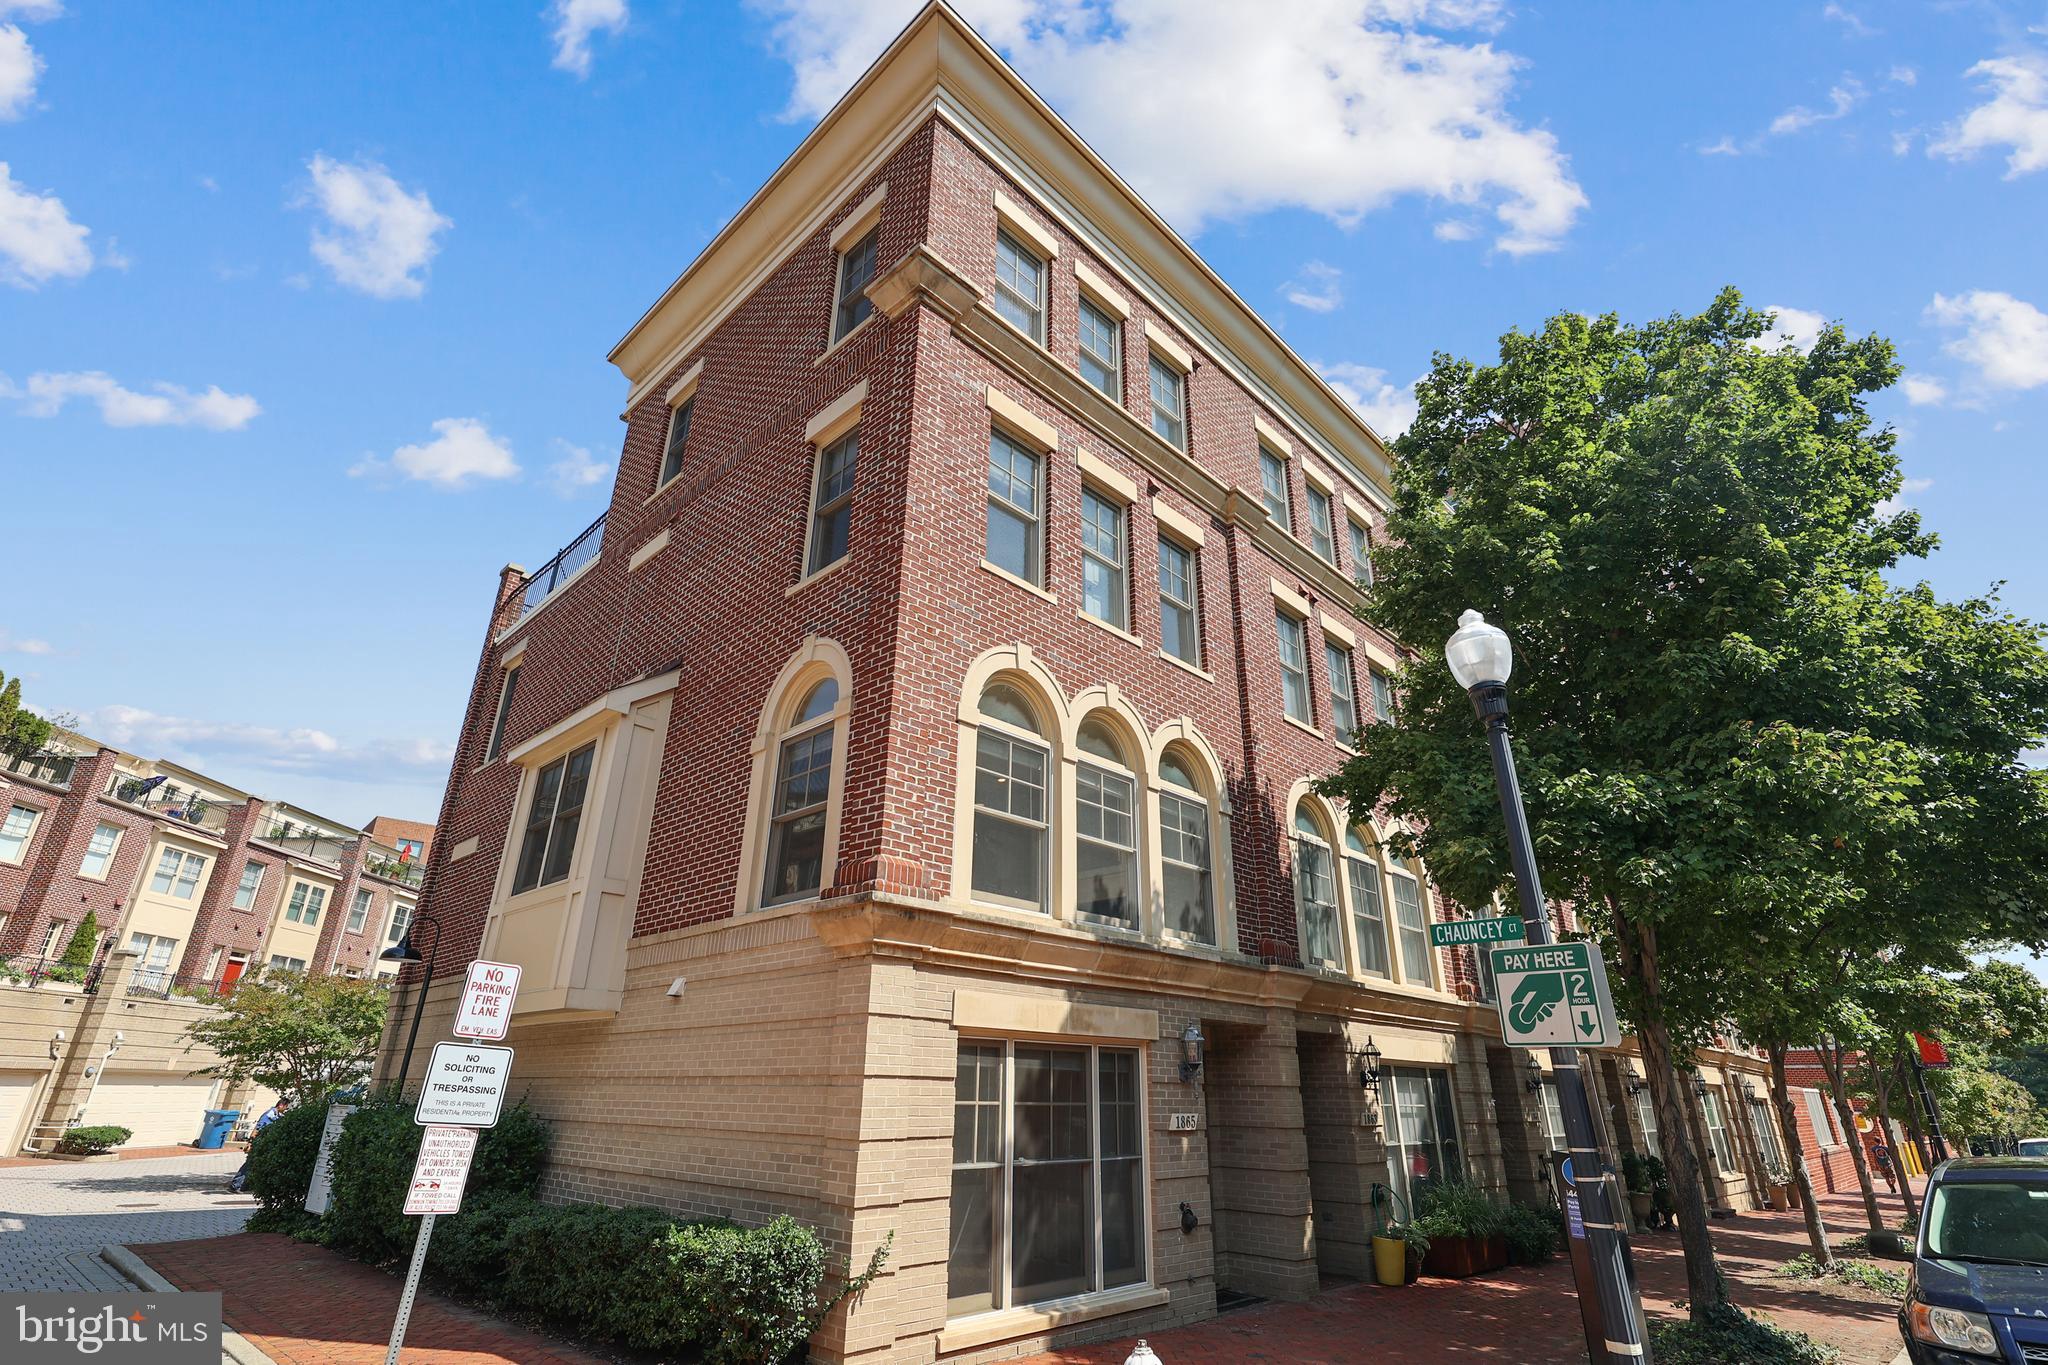 1865 Ballenger Avenue, Alexandria, VA 22314